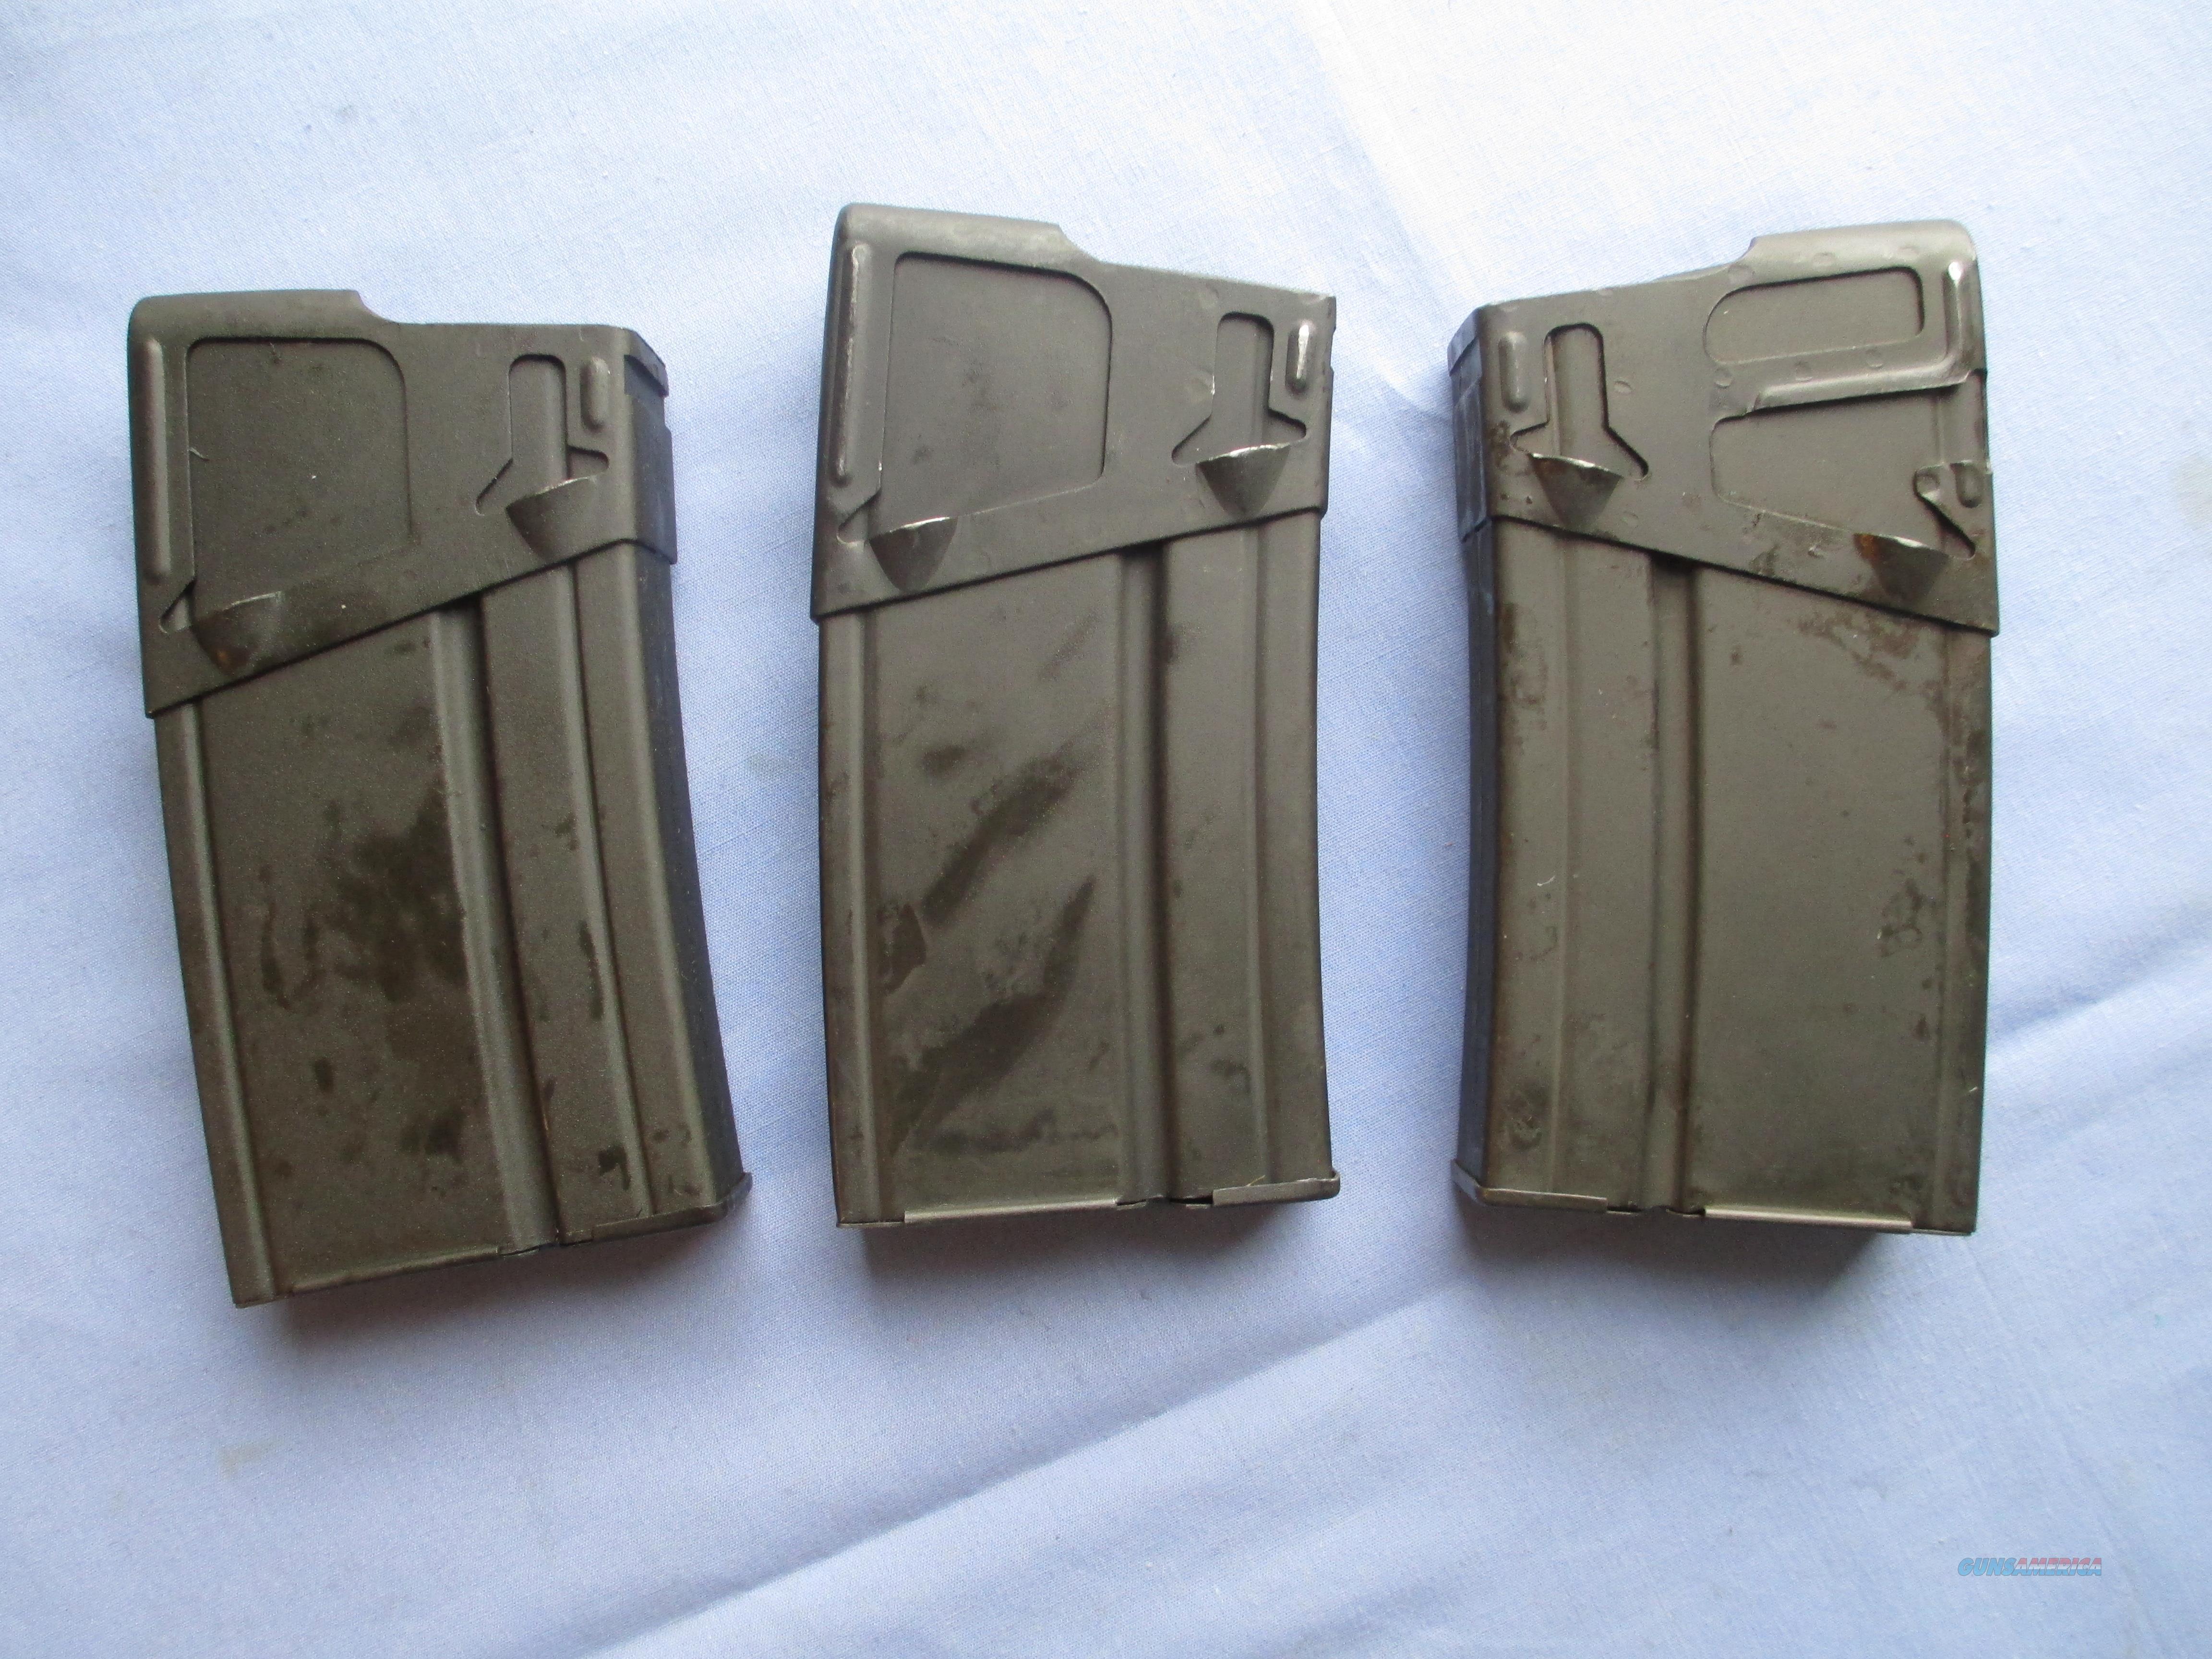 CETME STEEL 20RD MAGAZINES  NEW  Non-Guns > Magazines & Clips > Rifle Magazines > HK/CETME